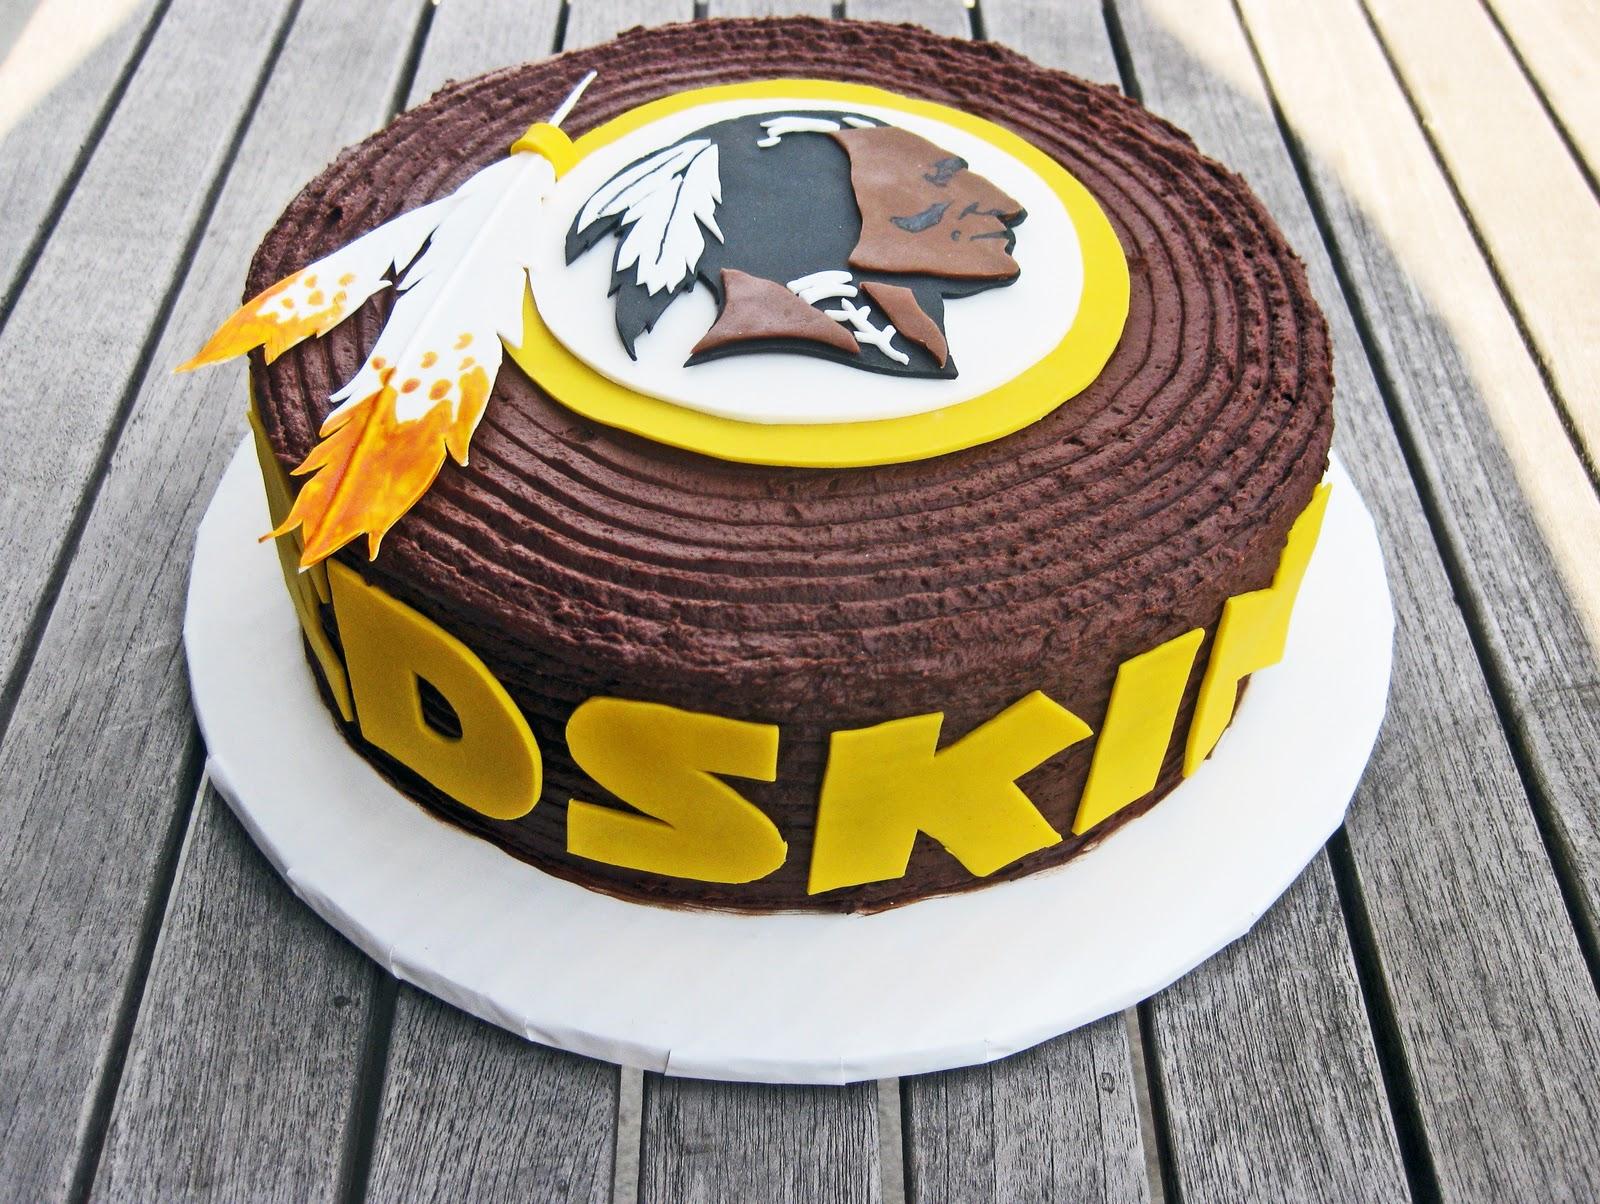 Redskins Cake Decorations